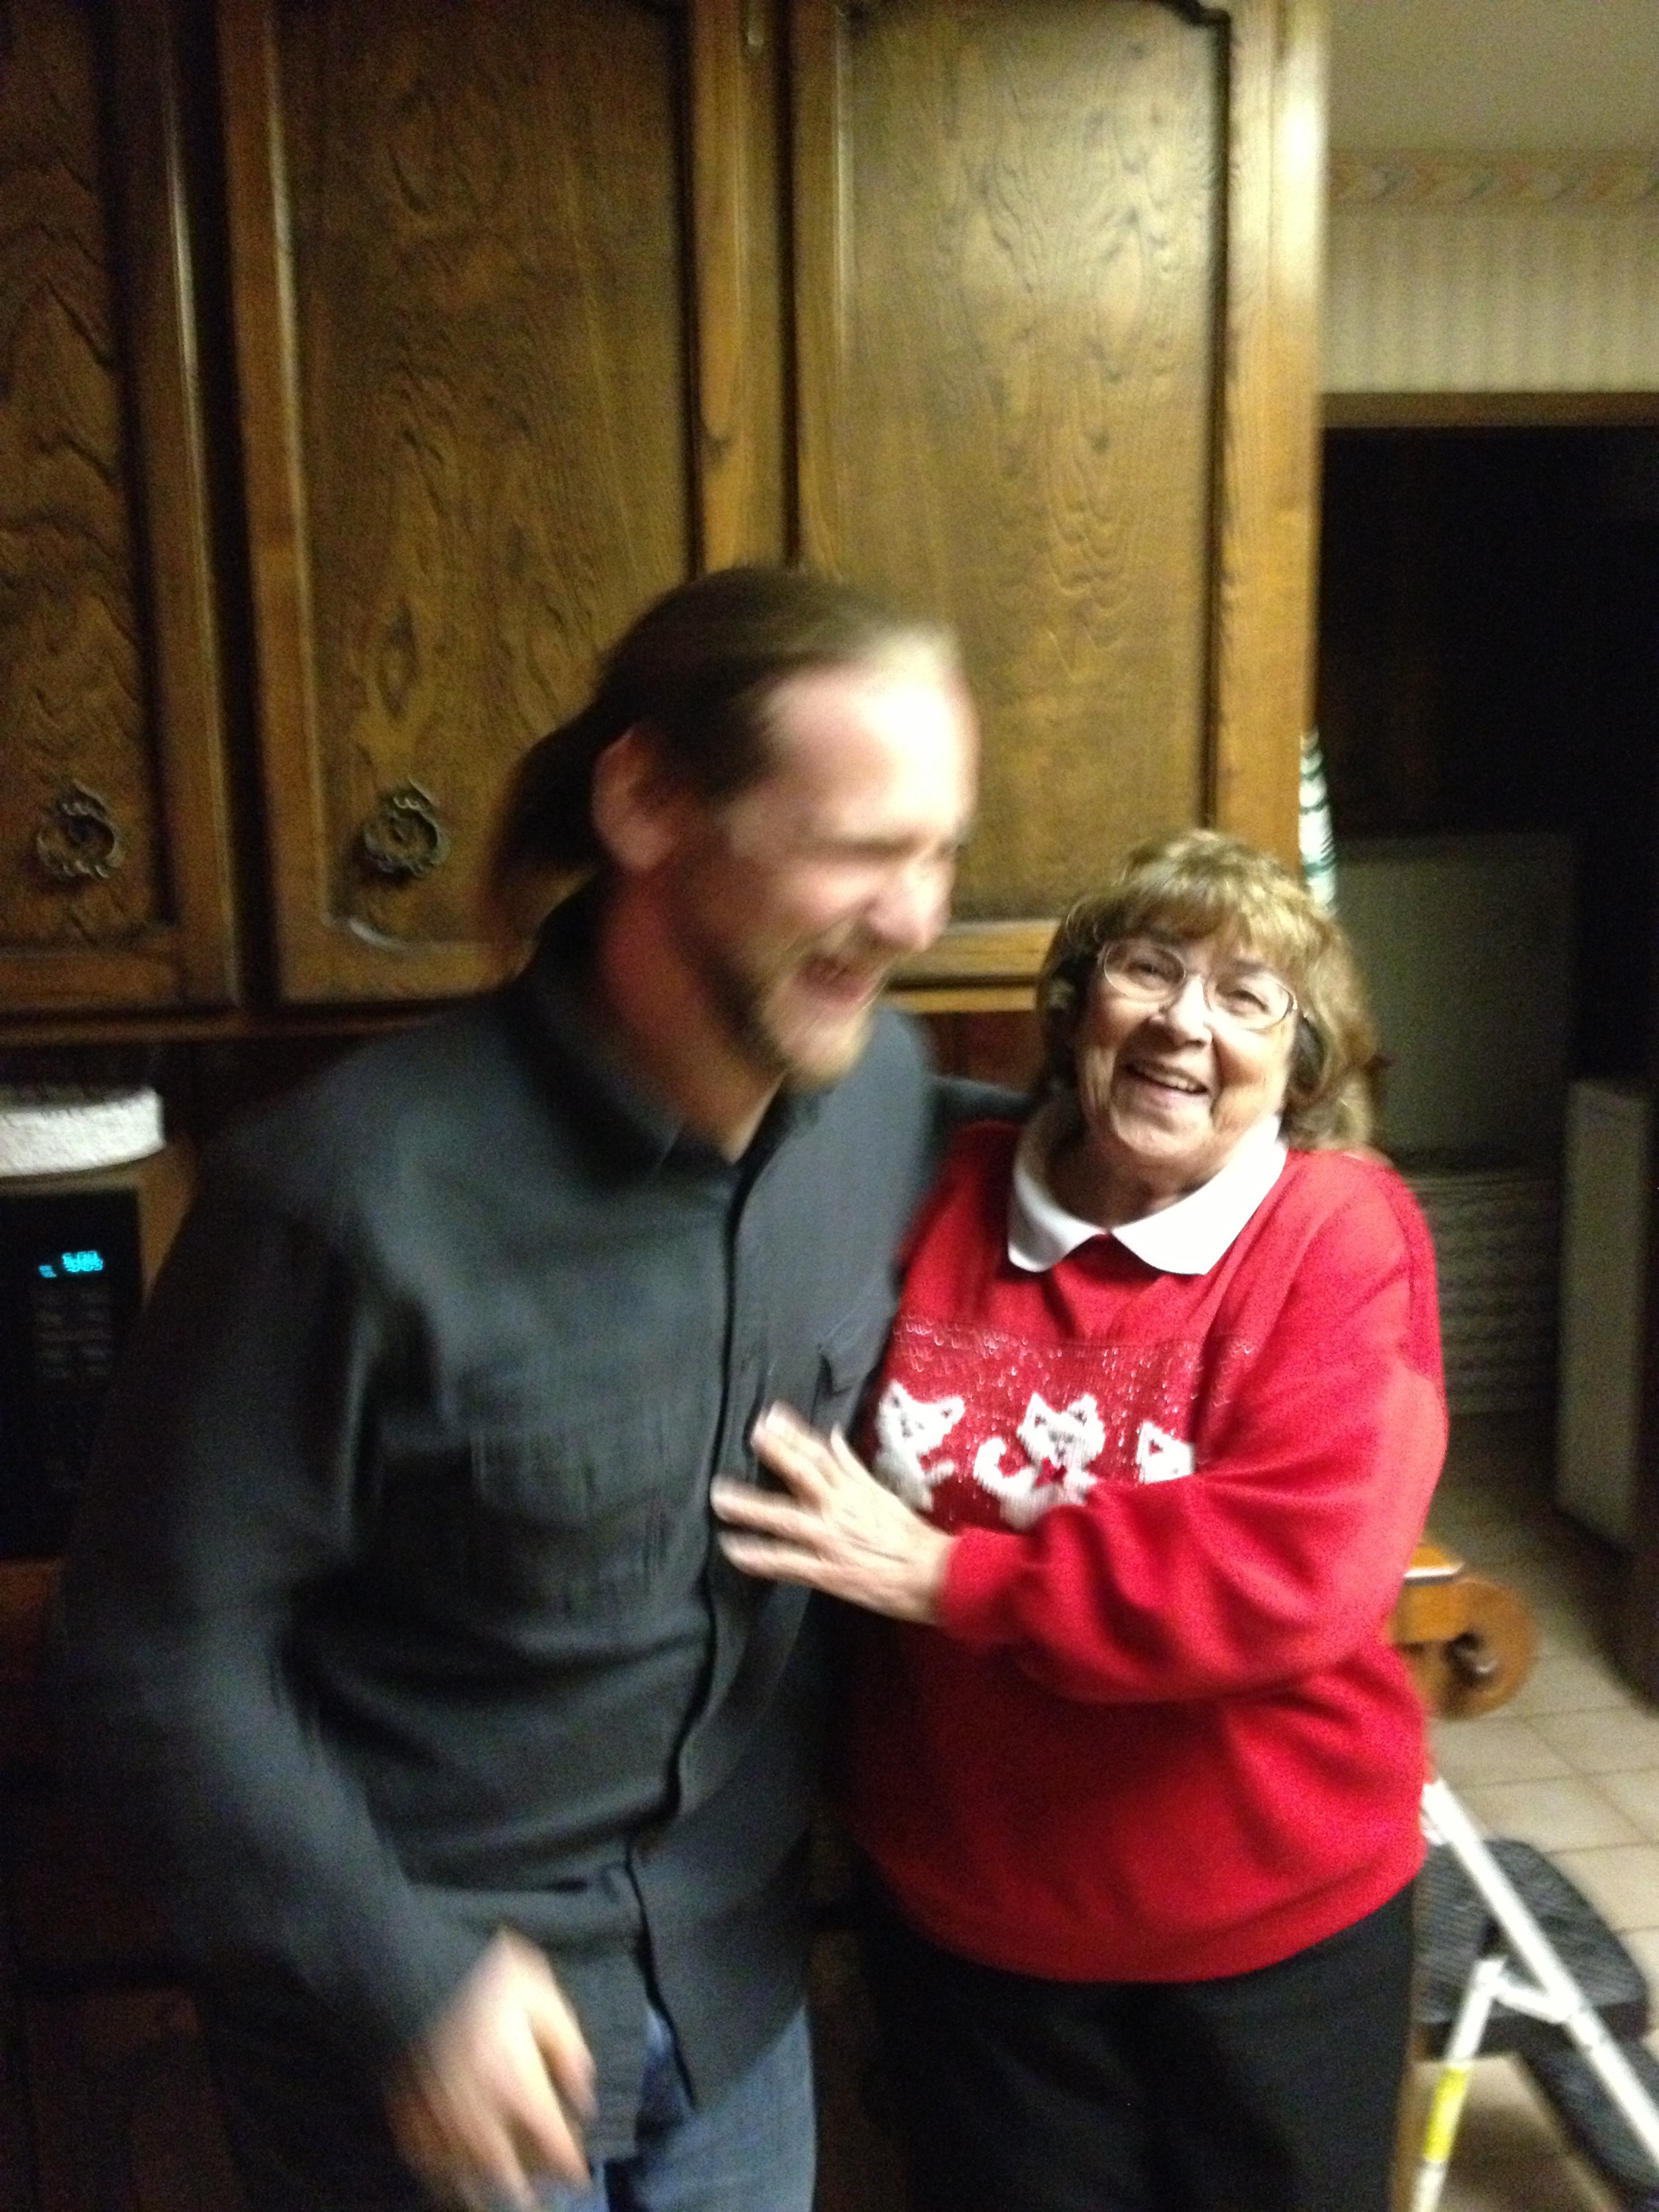 Me & my Grandma, whom I am missing dearly this Thanksgiving.